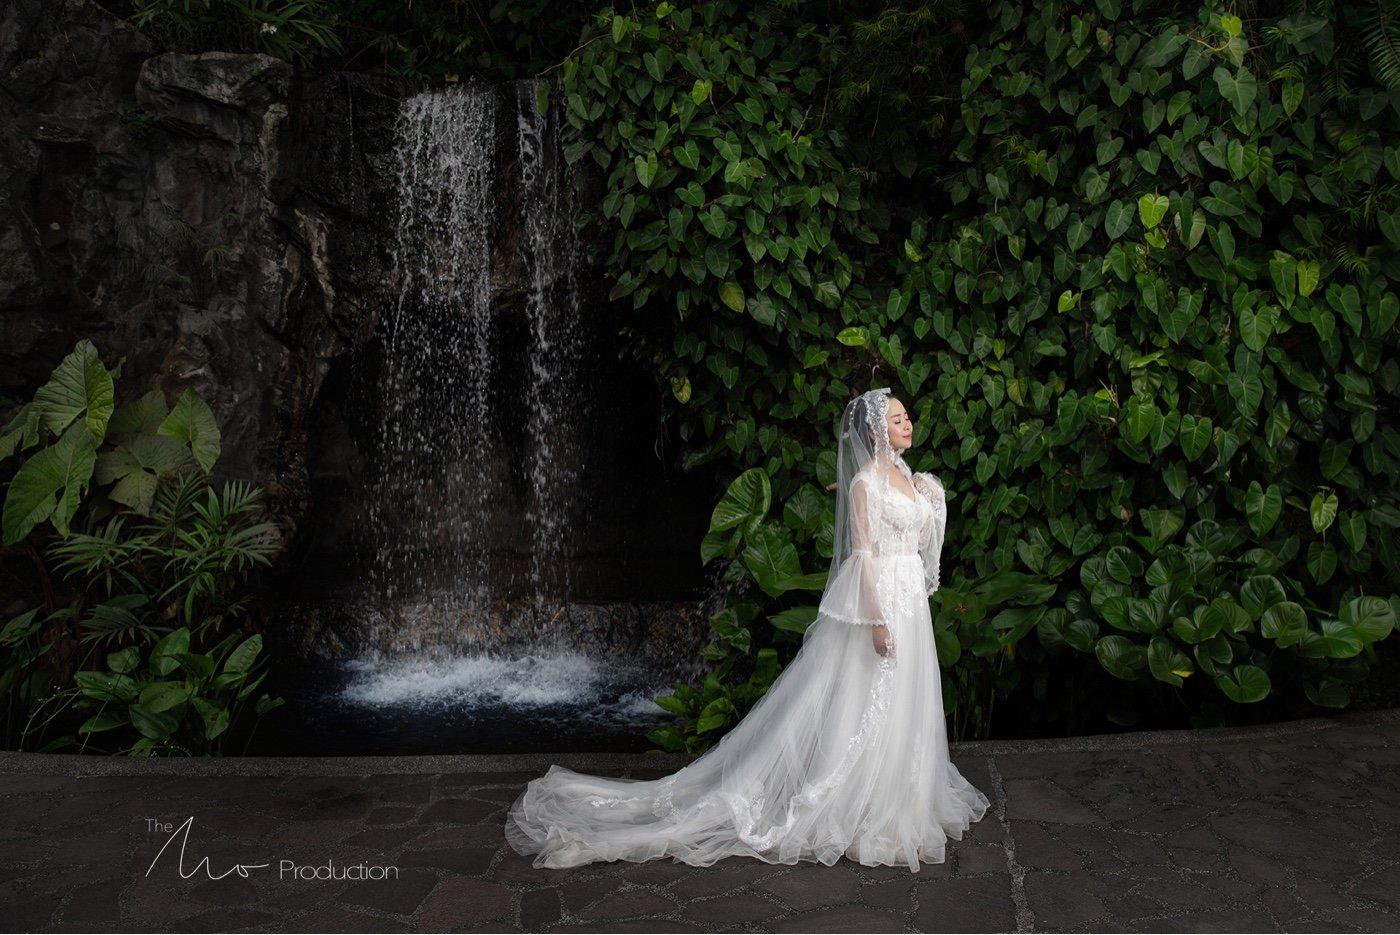 MoFoTo | 新加坡旅拍婚纱10